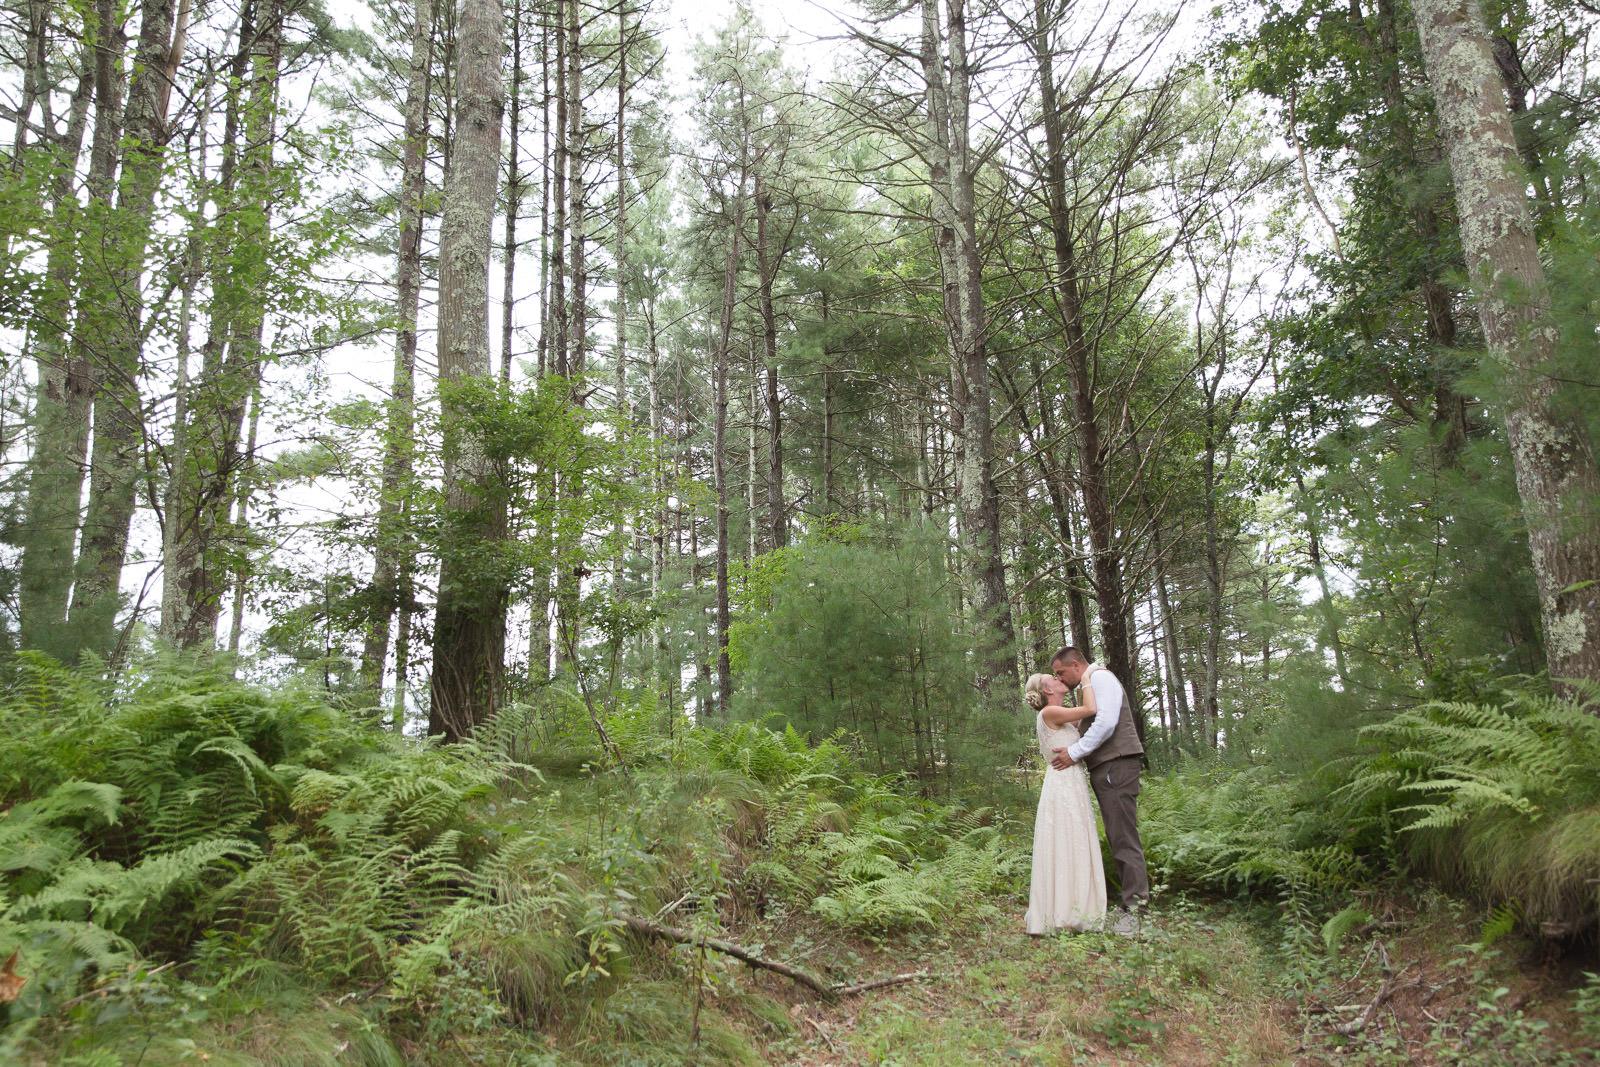 Coventry, Rhode Island, RI, Backyard Wedding, forest, earthy, wedding, tracy jenkins photography, wedding photographer, ri wedding photographer, Rhode Island Wedding photographer, couple photos, romantic photos, wedding in the woods